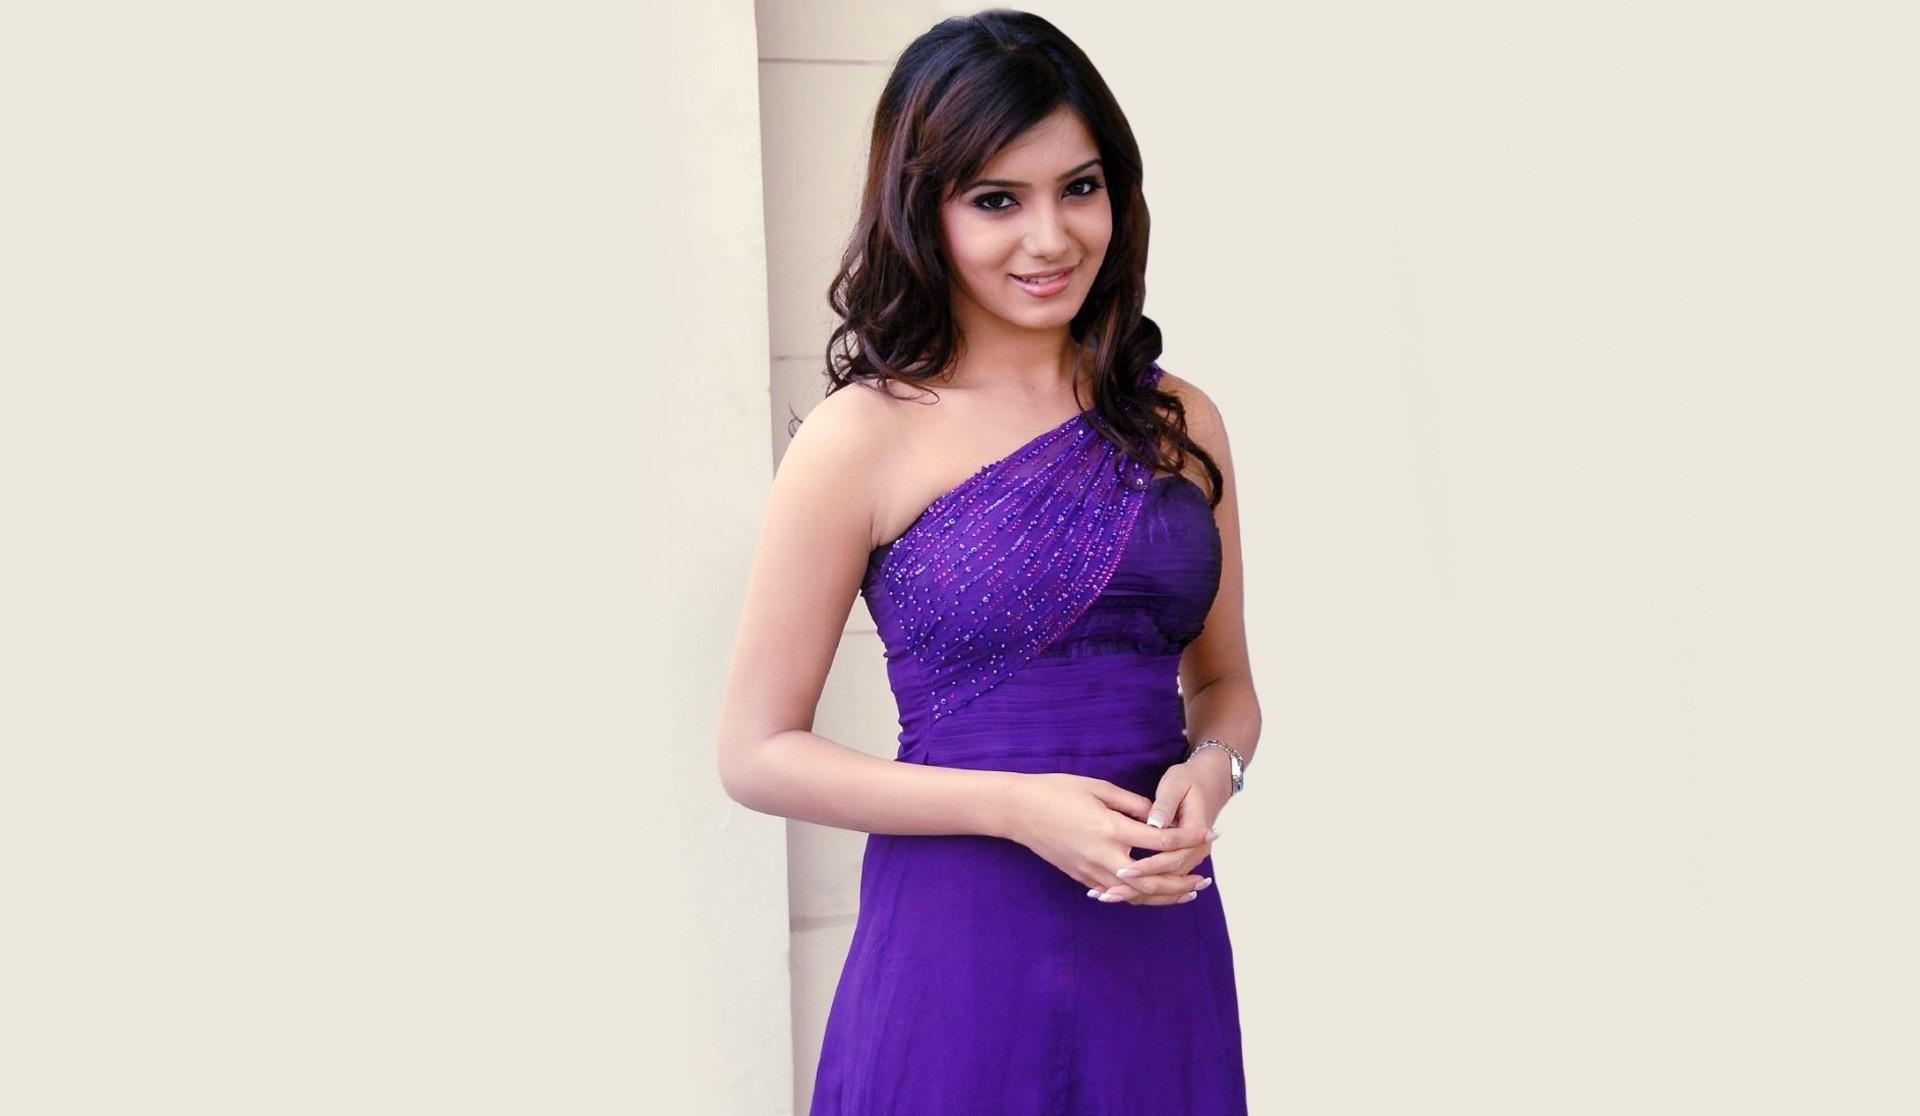 samantha hot photos in sexy dress and hd wallpaper | welcomenri